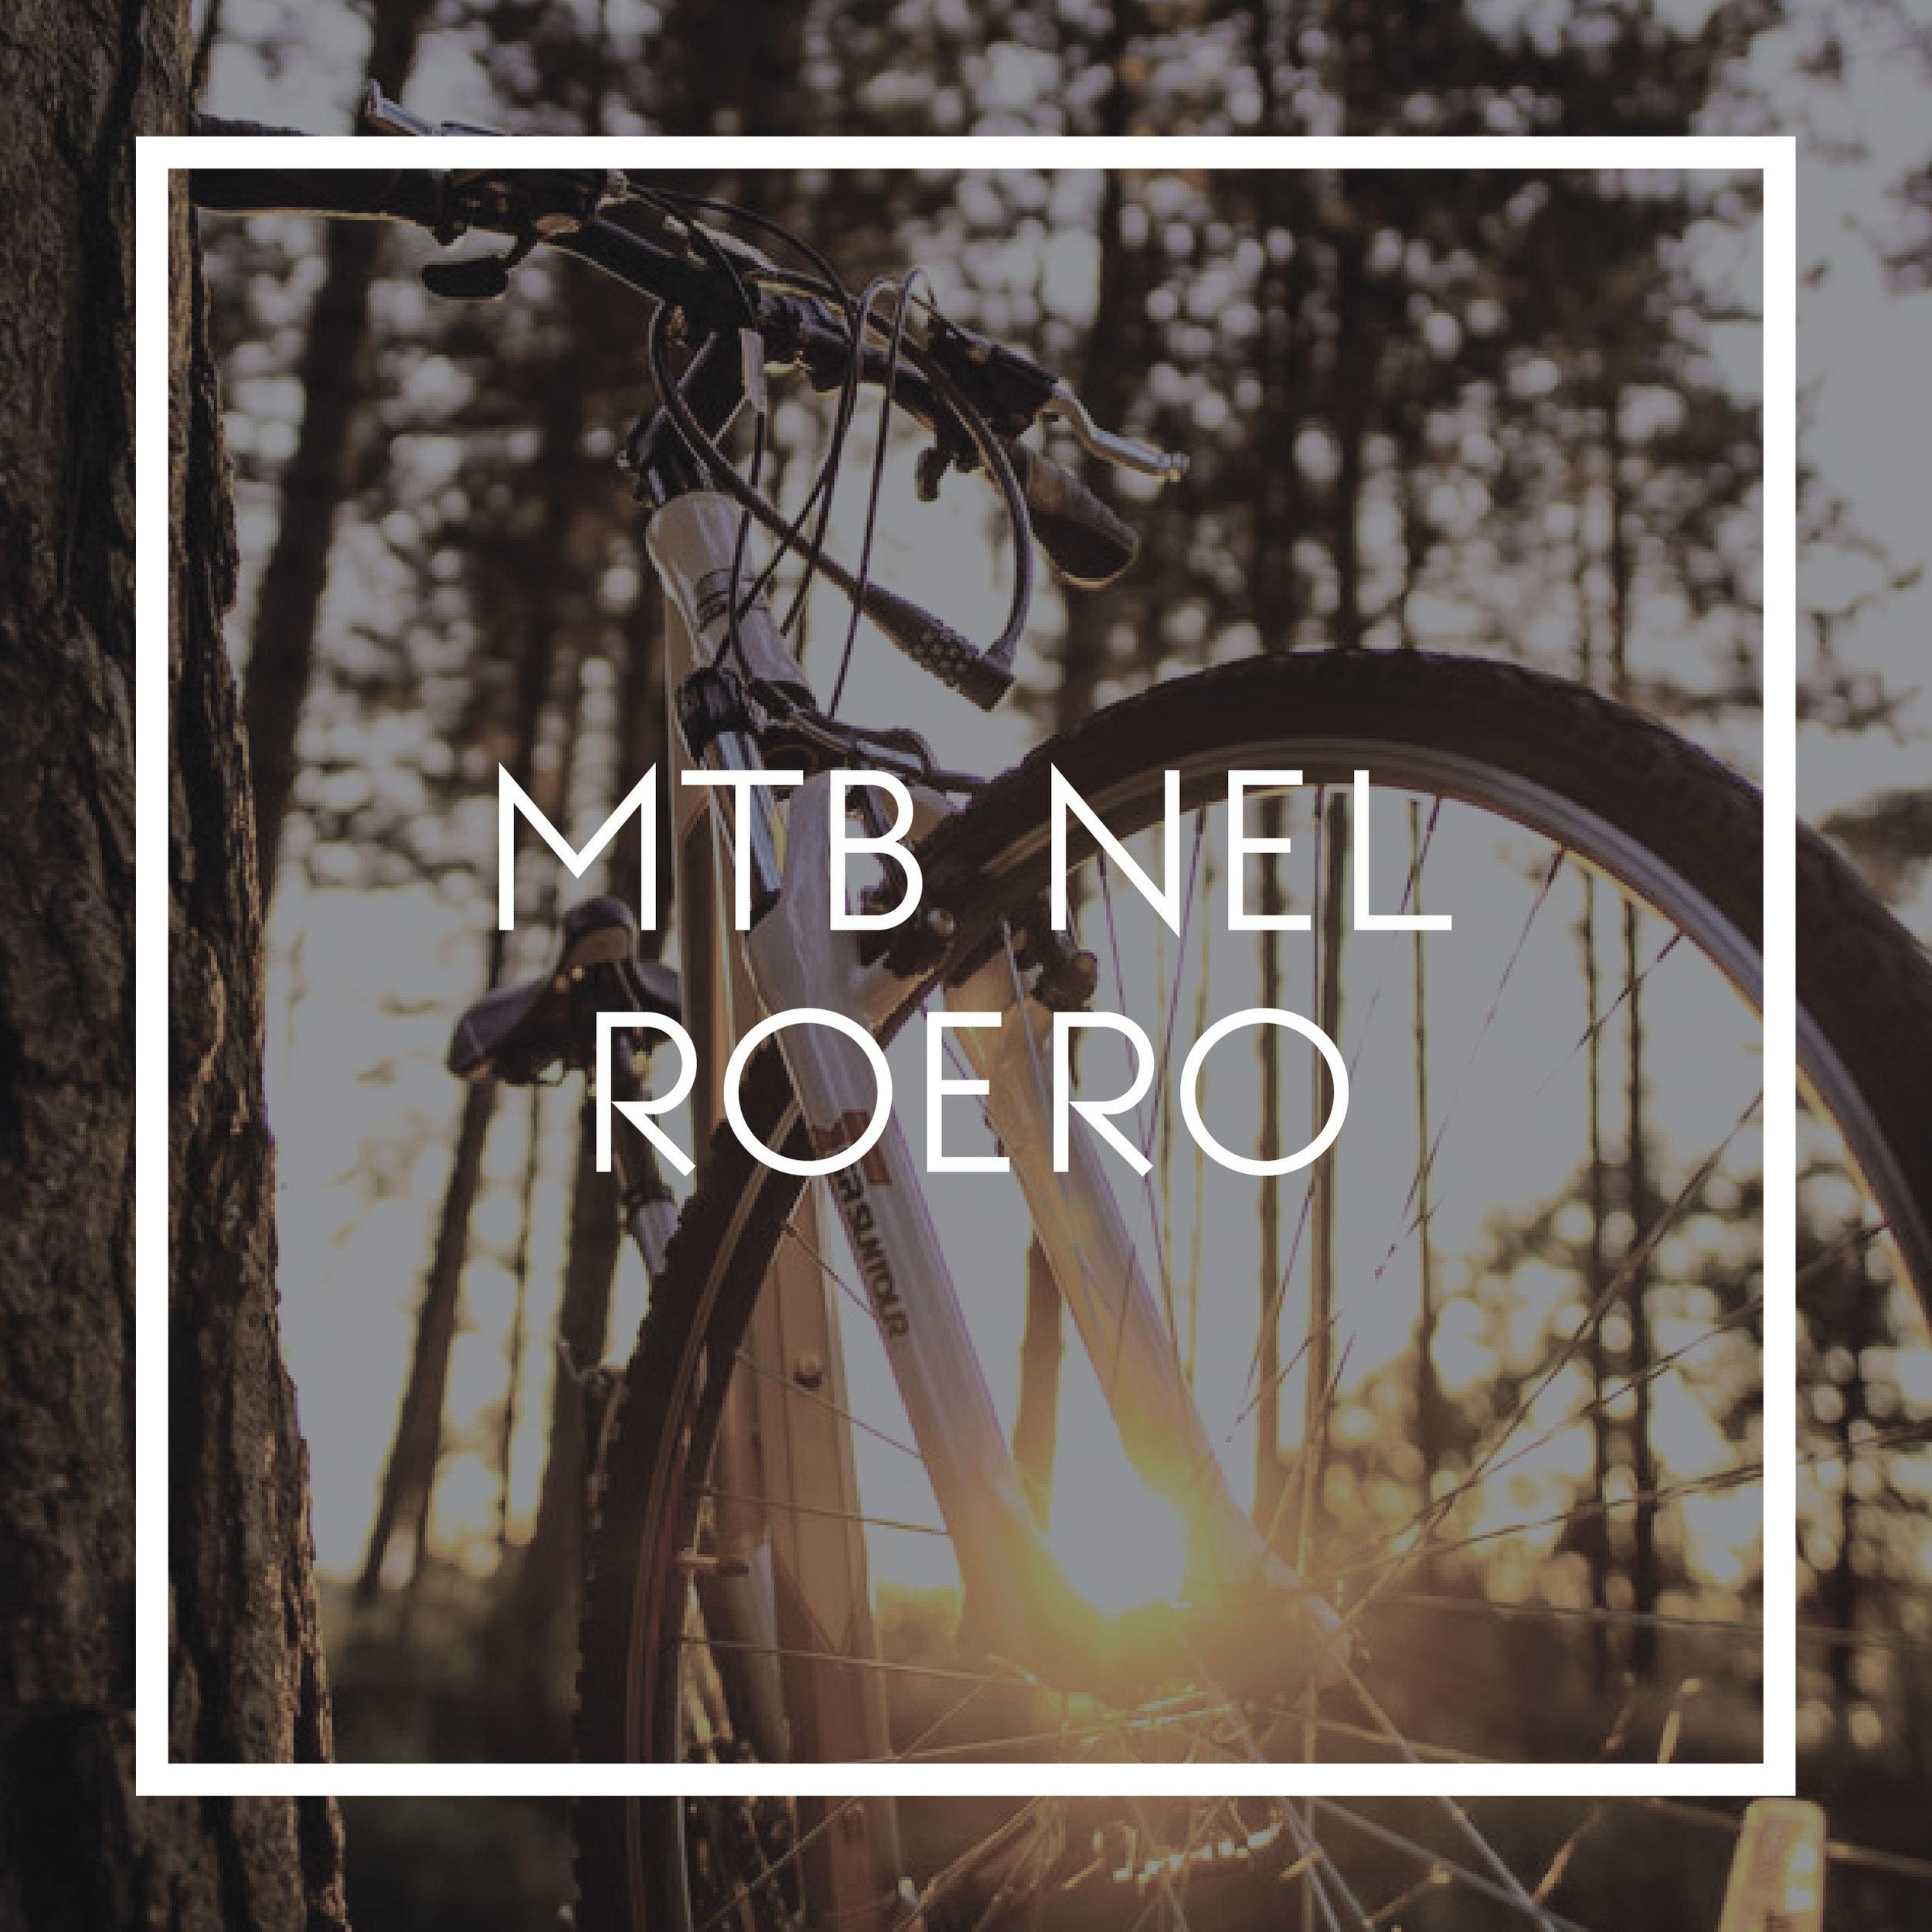 mtb_nel_roero.jpg